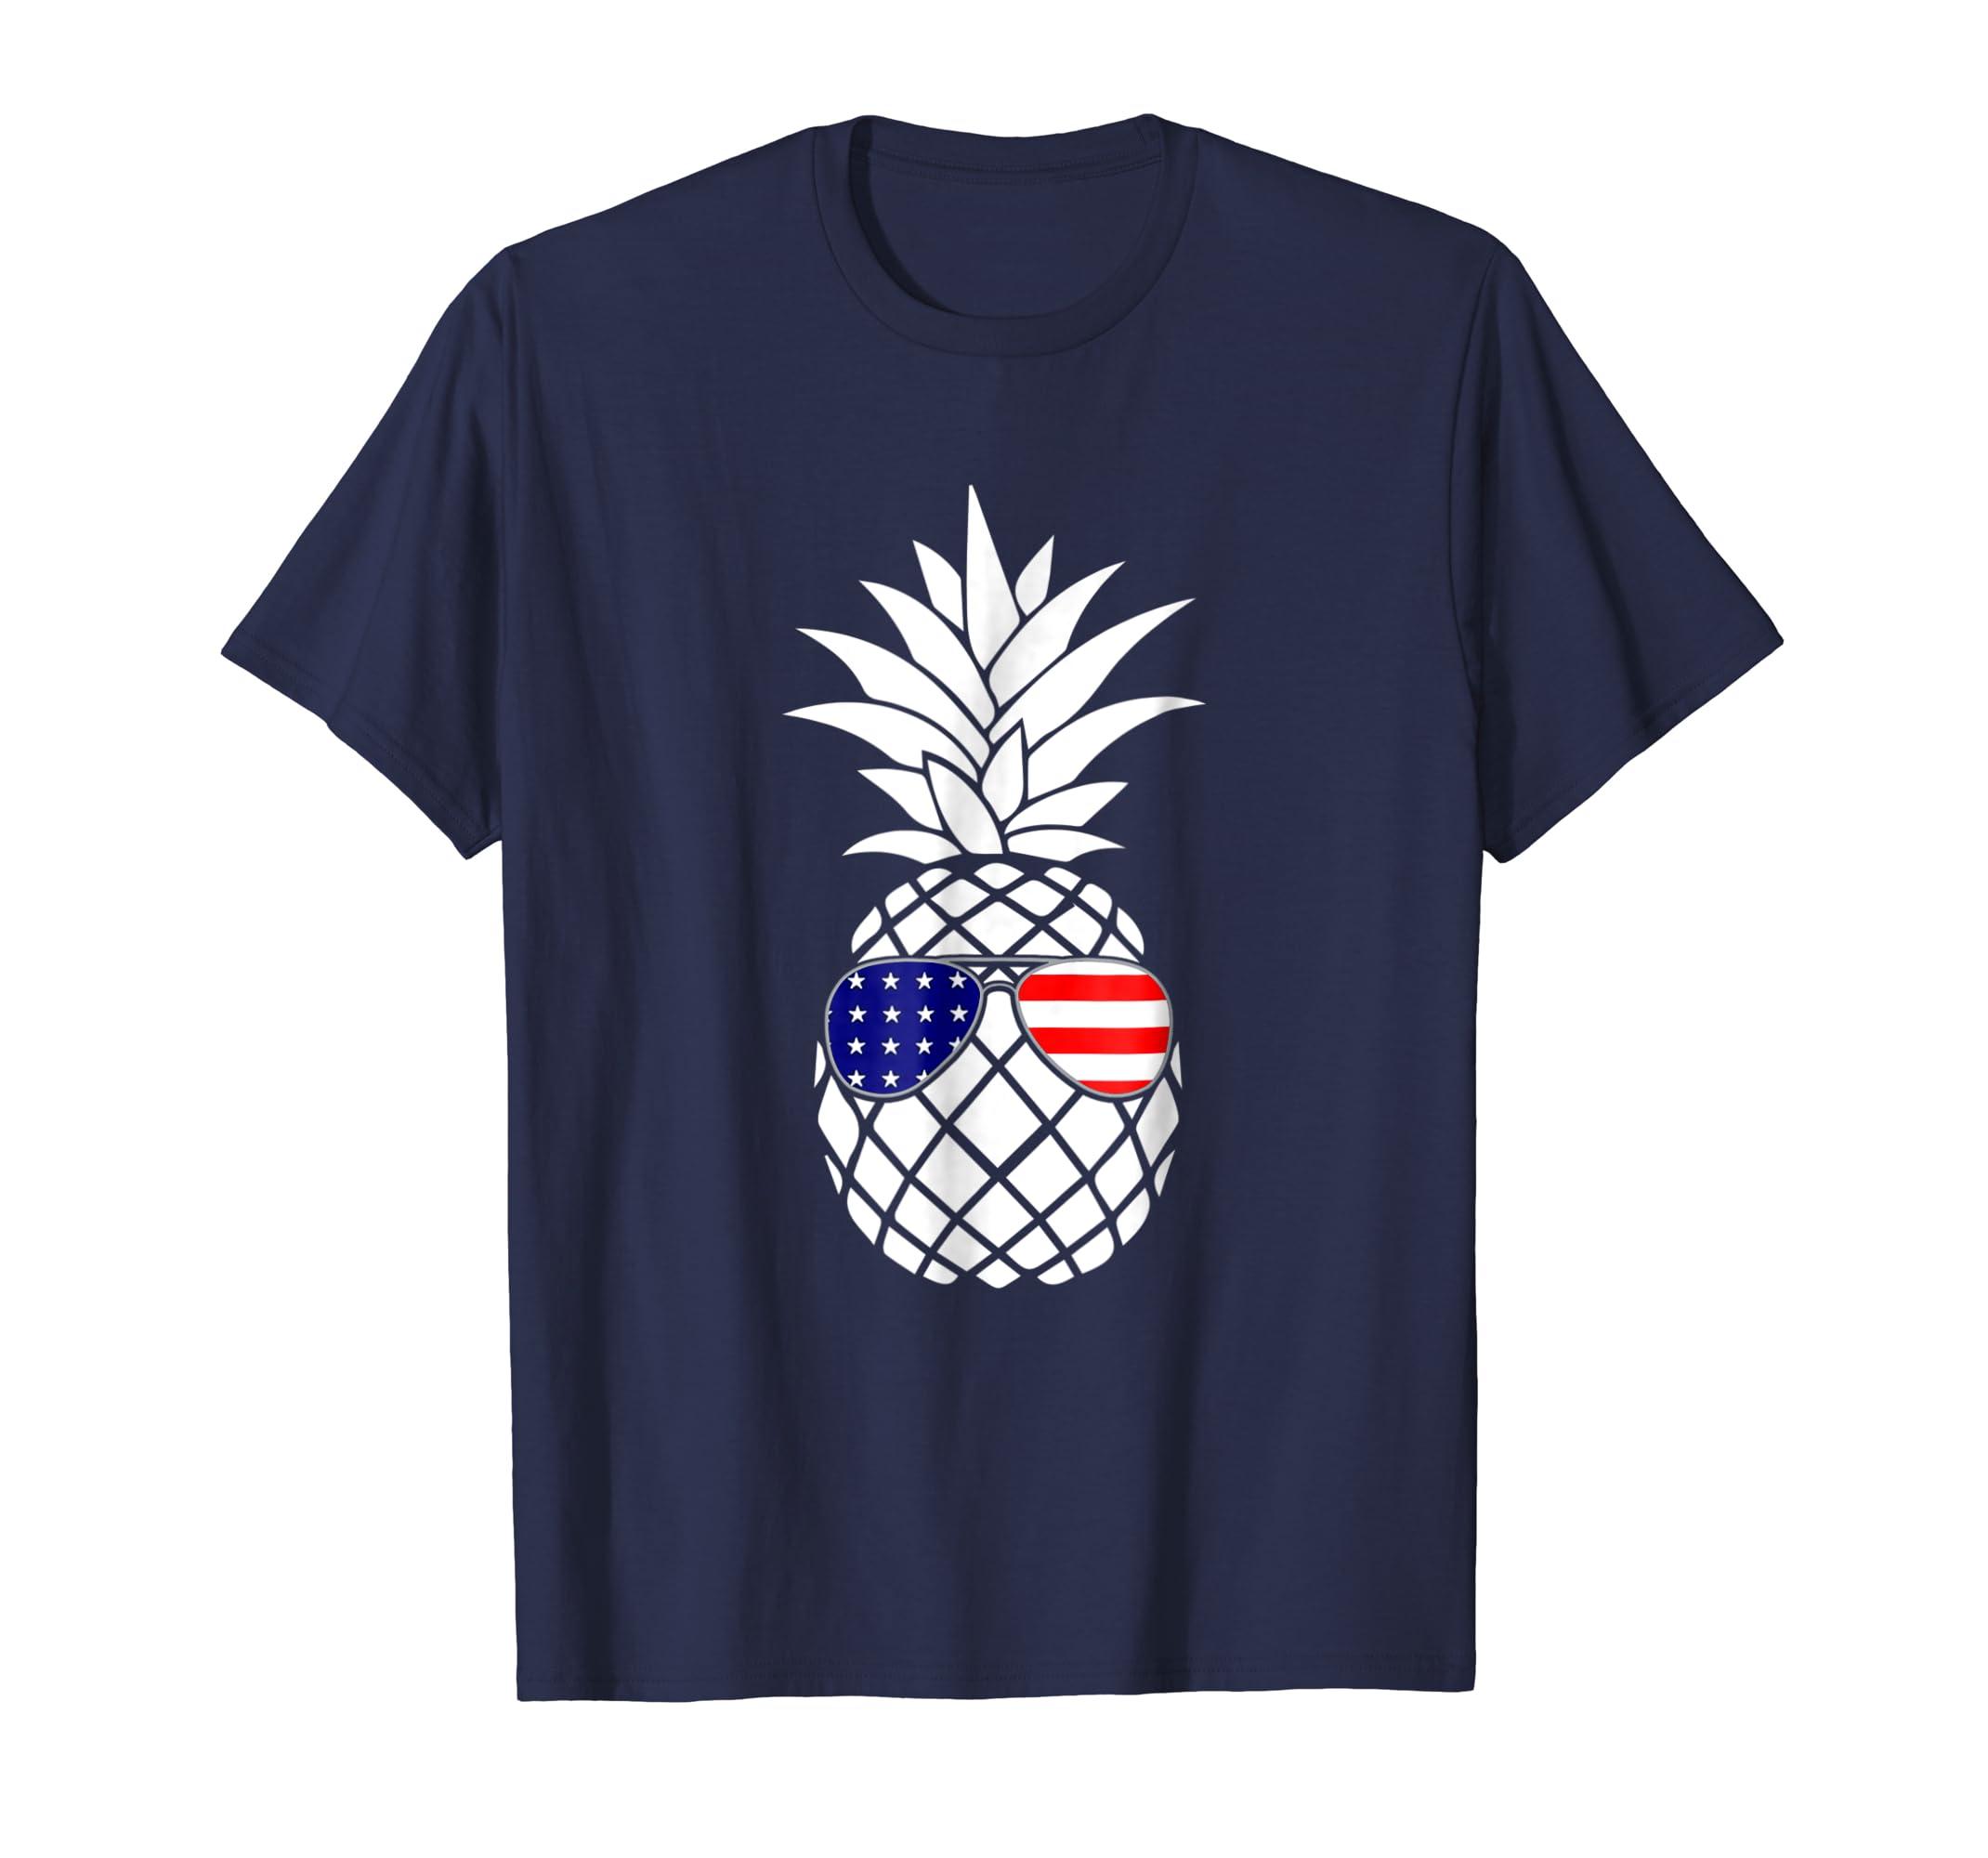 Patriotic Pineapple T-Shirt 4th July Glasses American Flag